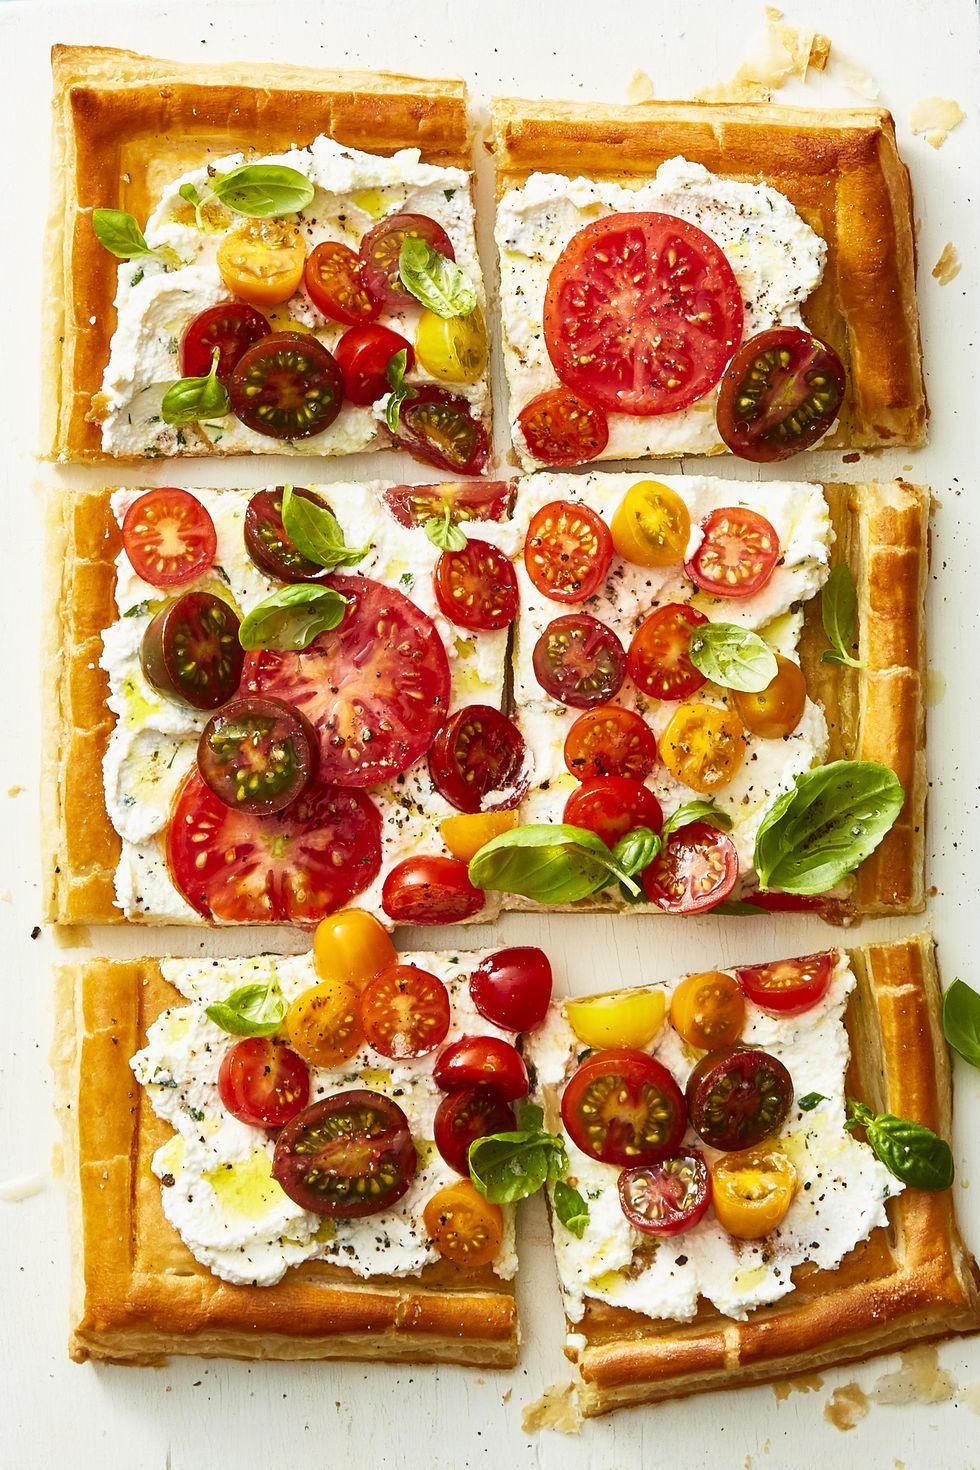 Good Healthy Recipes U0026 Meal Ideas